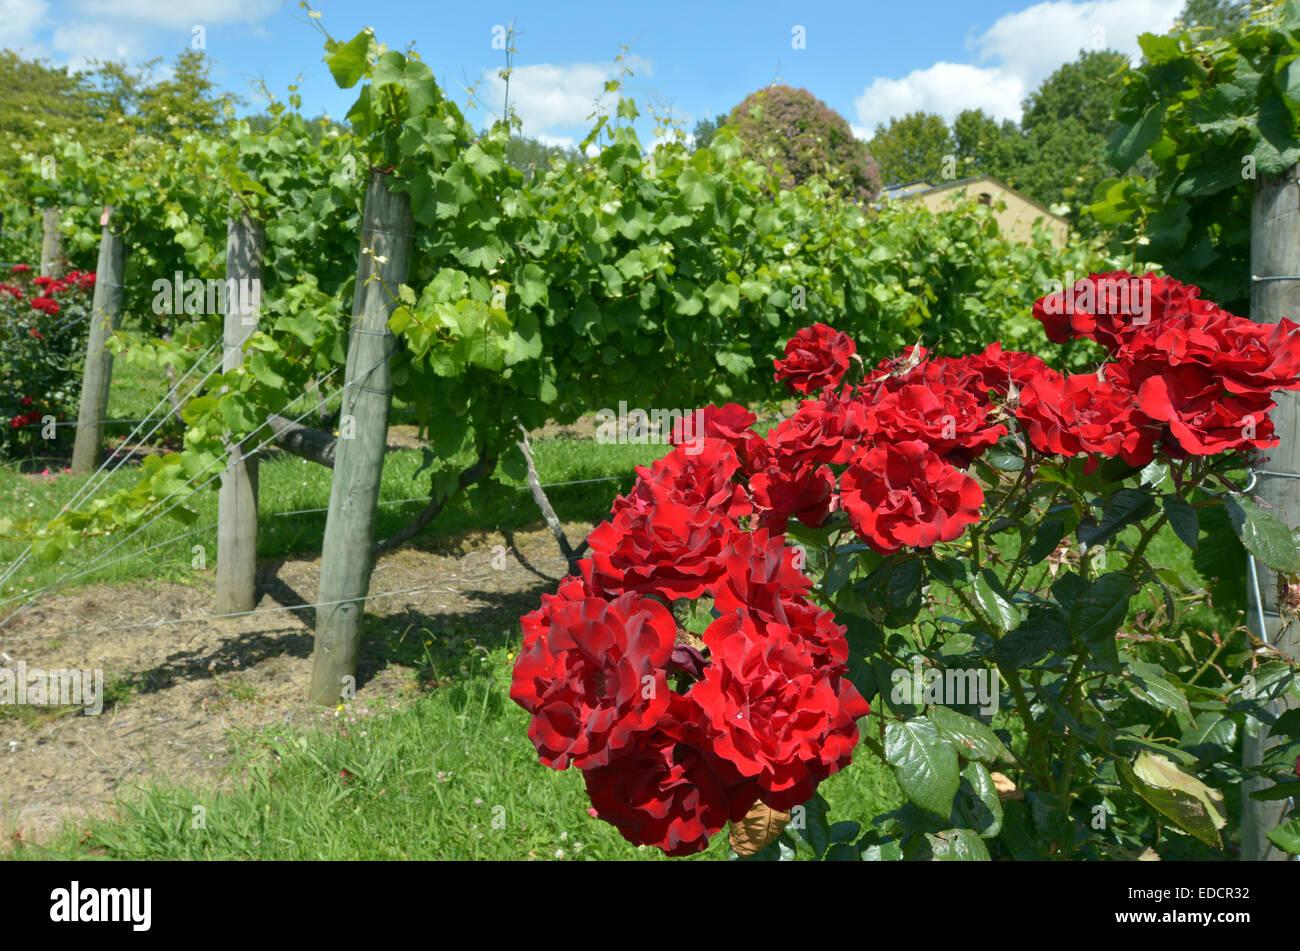 roses and vineyard stockfotos roses and vineyard bilder alamy. Black Bedroom Furniture Sets. Home Design Ideas